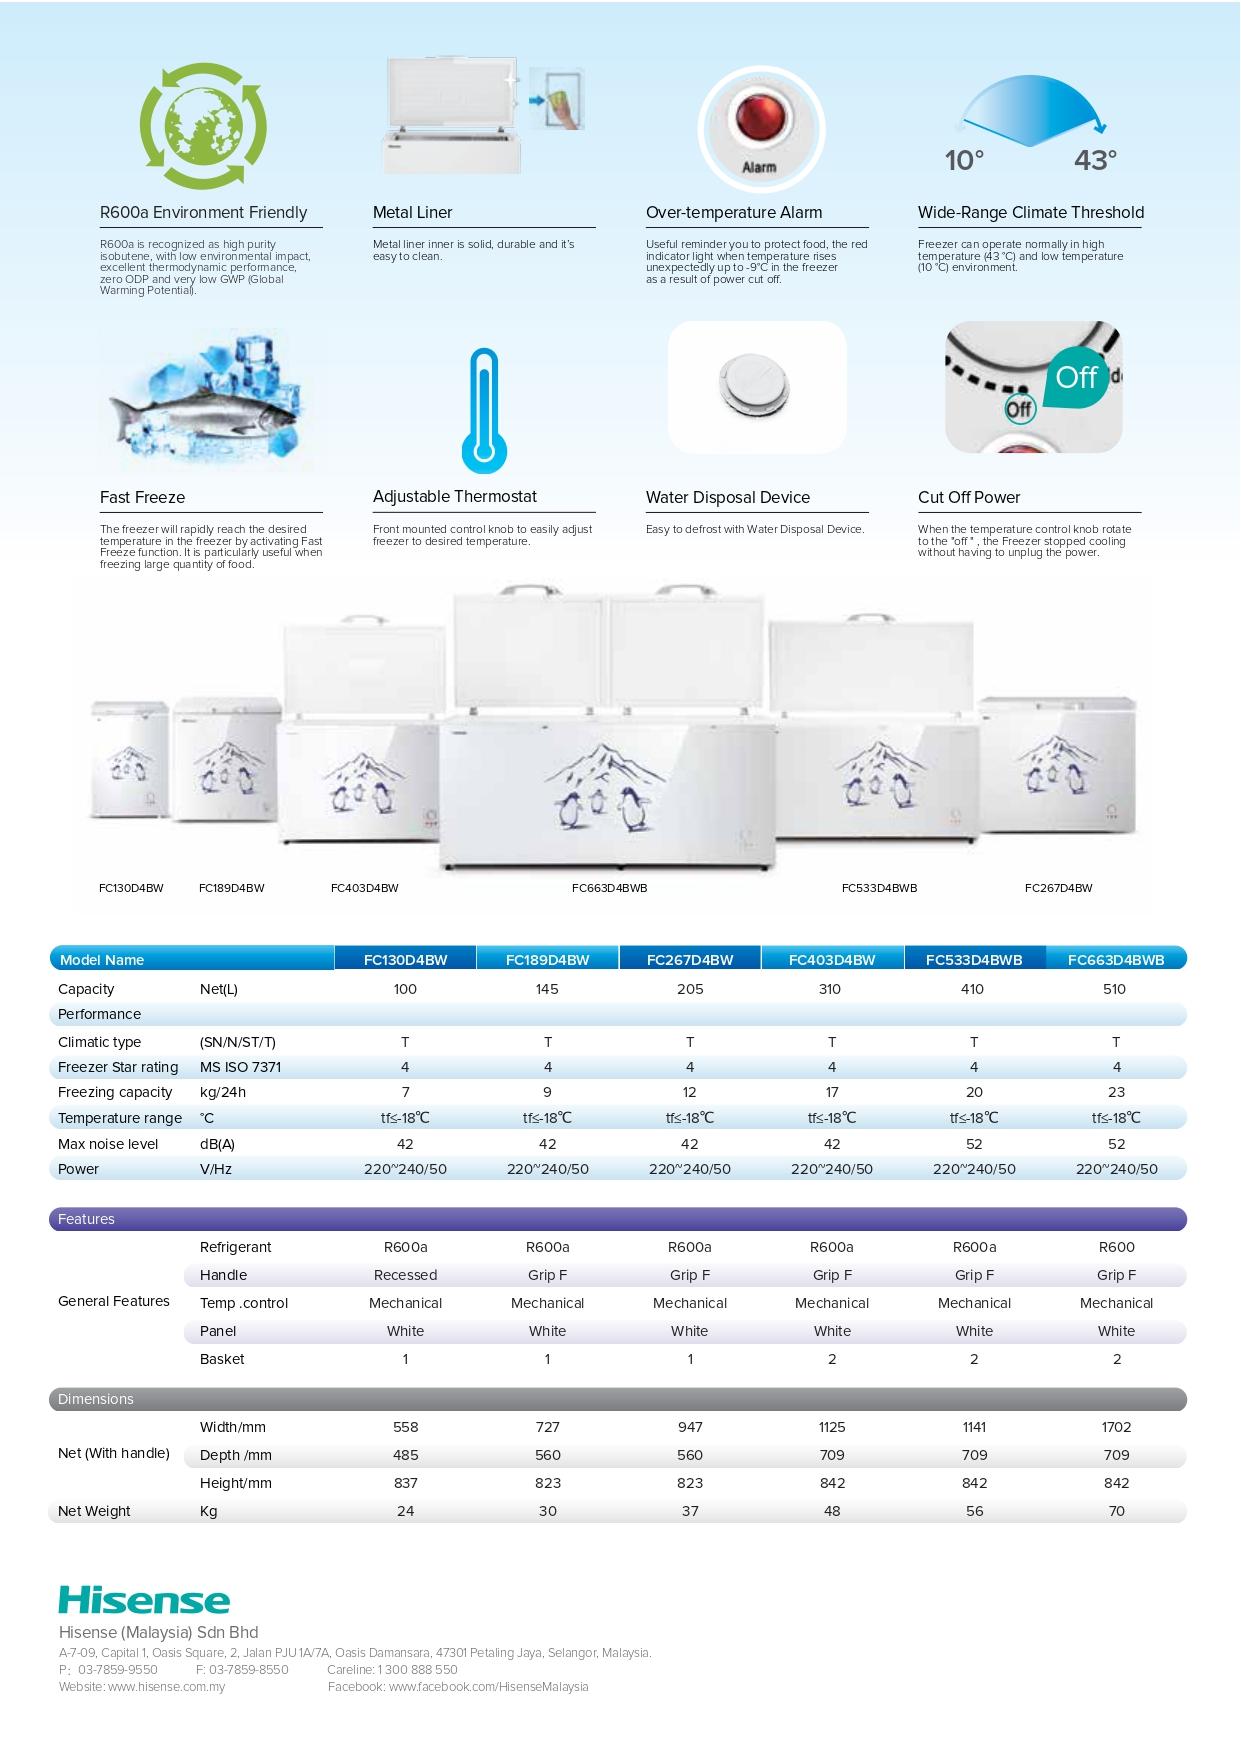 Hisense-Freezer-Leaflet_page-0002.jpg